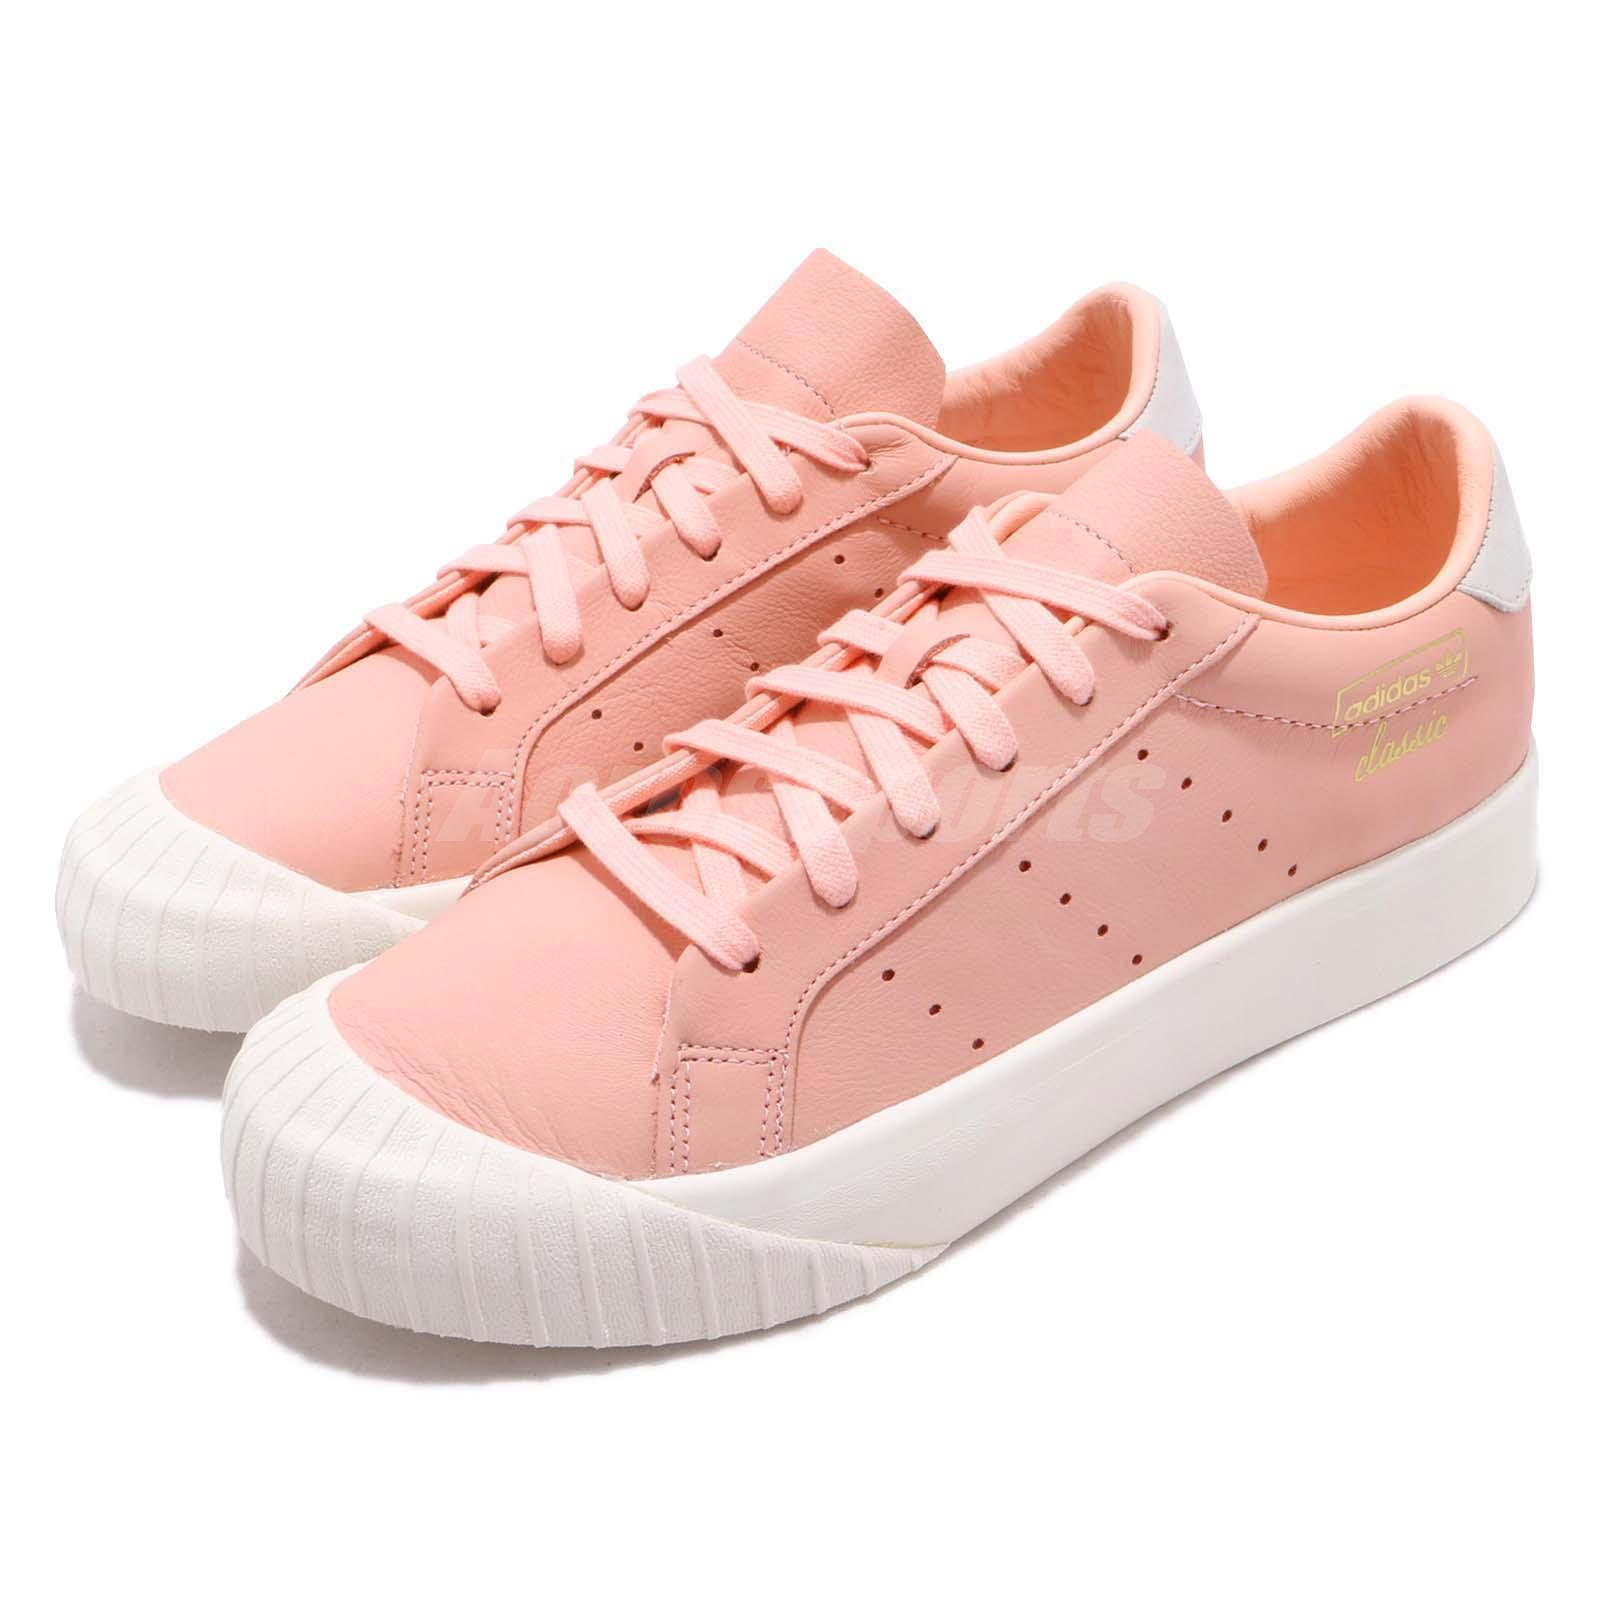 6dd9f7115d Details about adidas Originals Everyn W Clear Orange Off White Women  Classic Shoes B37450